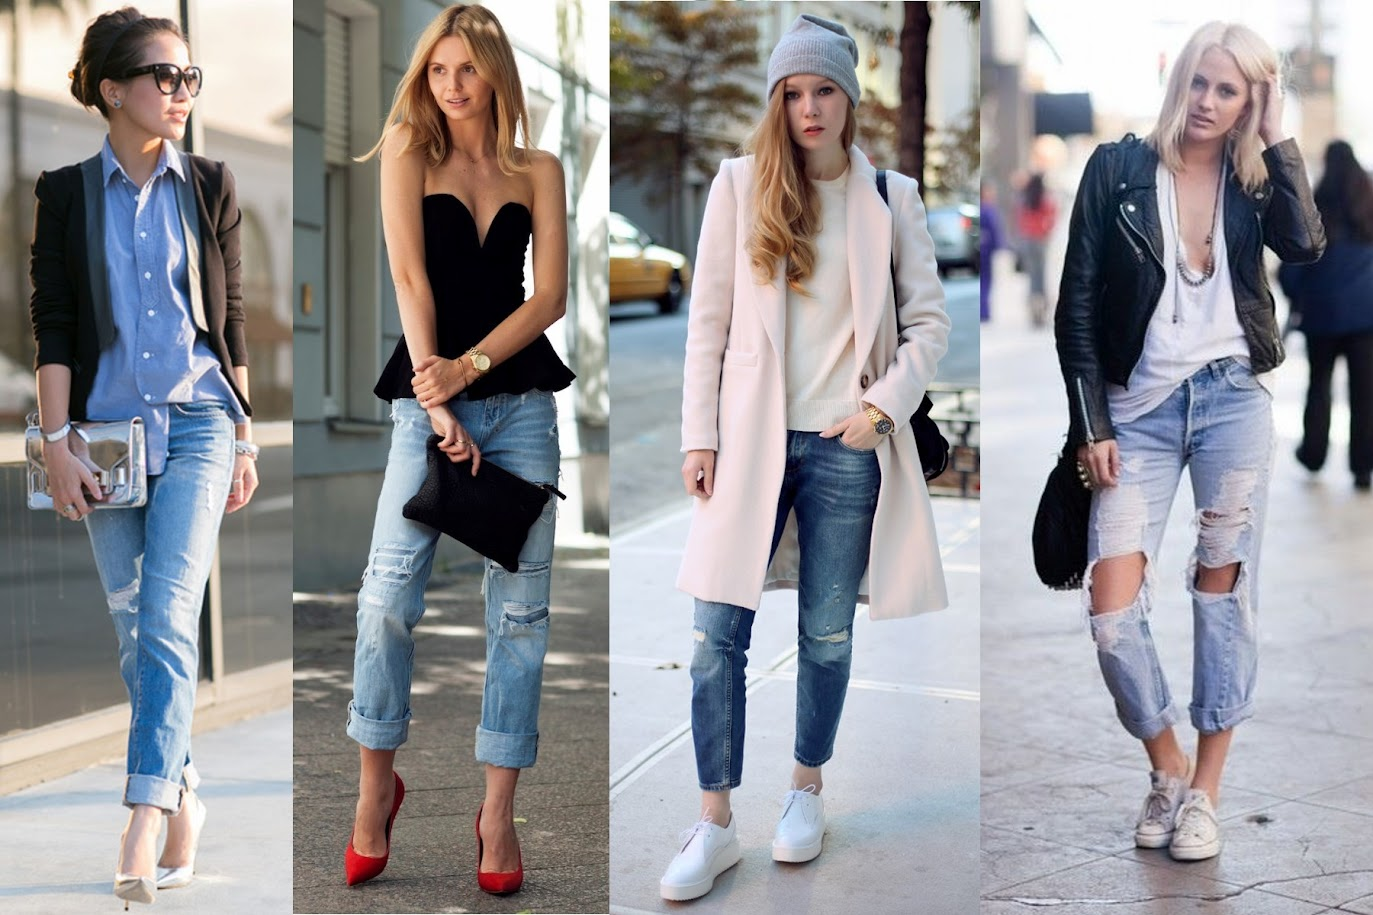 Женские джинсы бойфренды в магазине IssaPlus